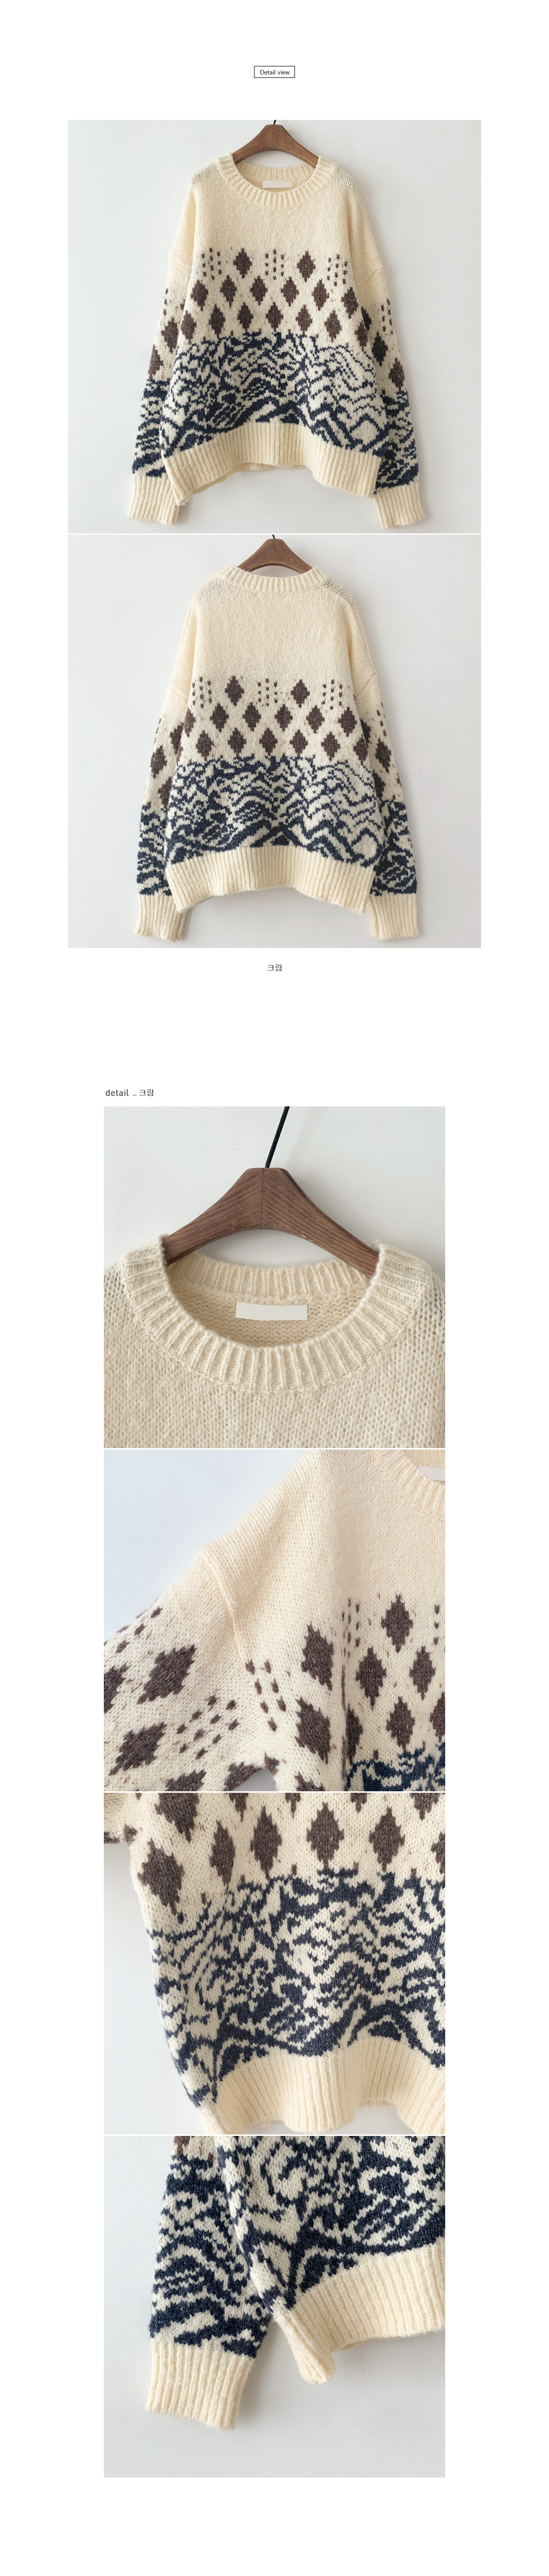 Argyle Vintage Knitwear